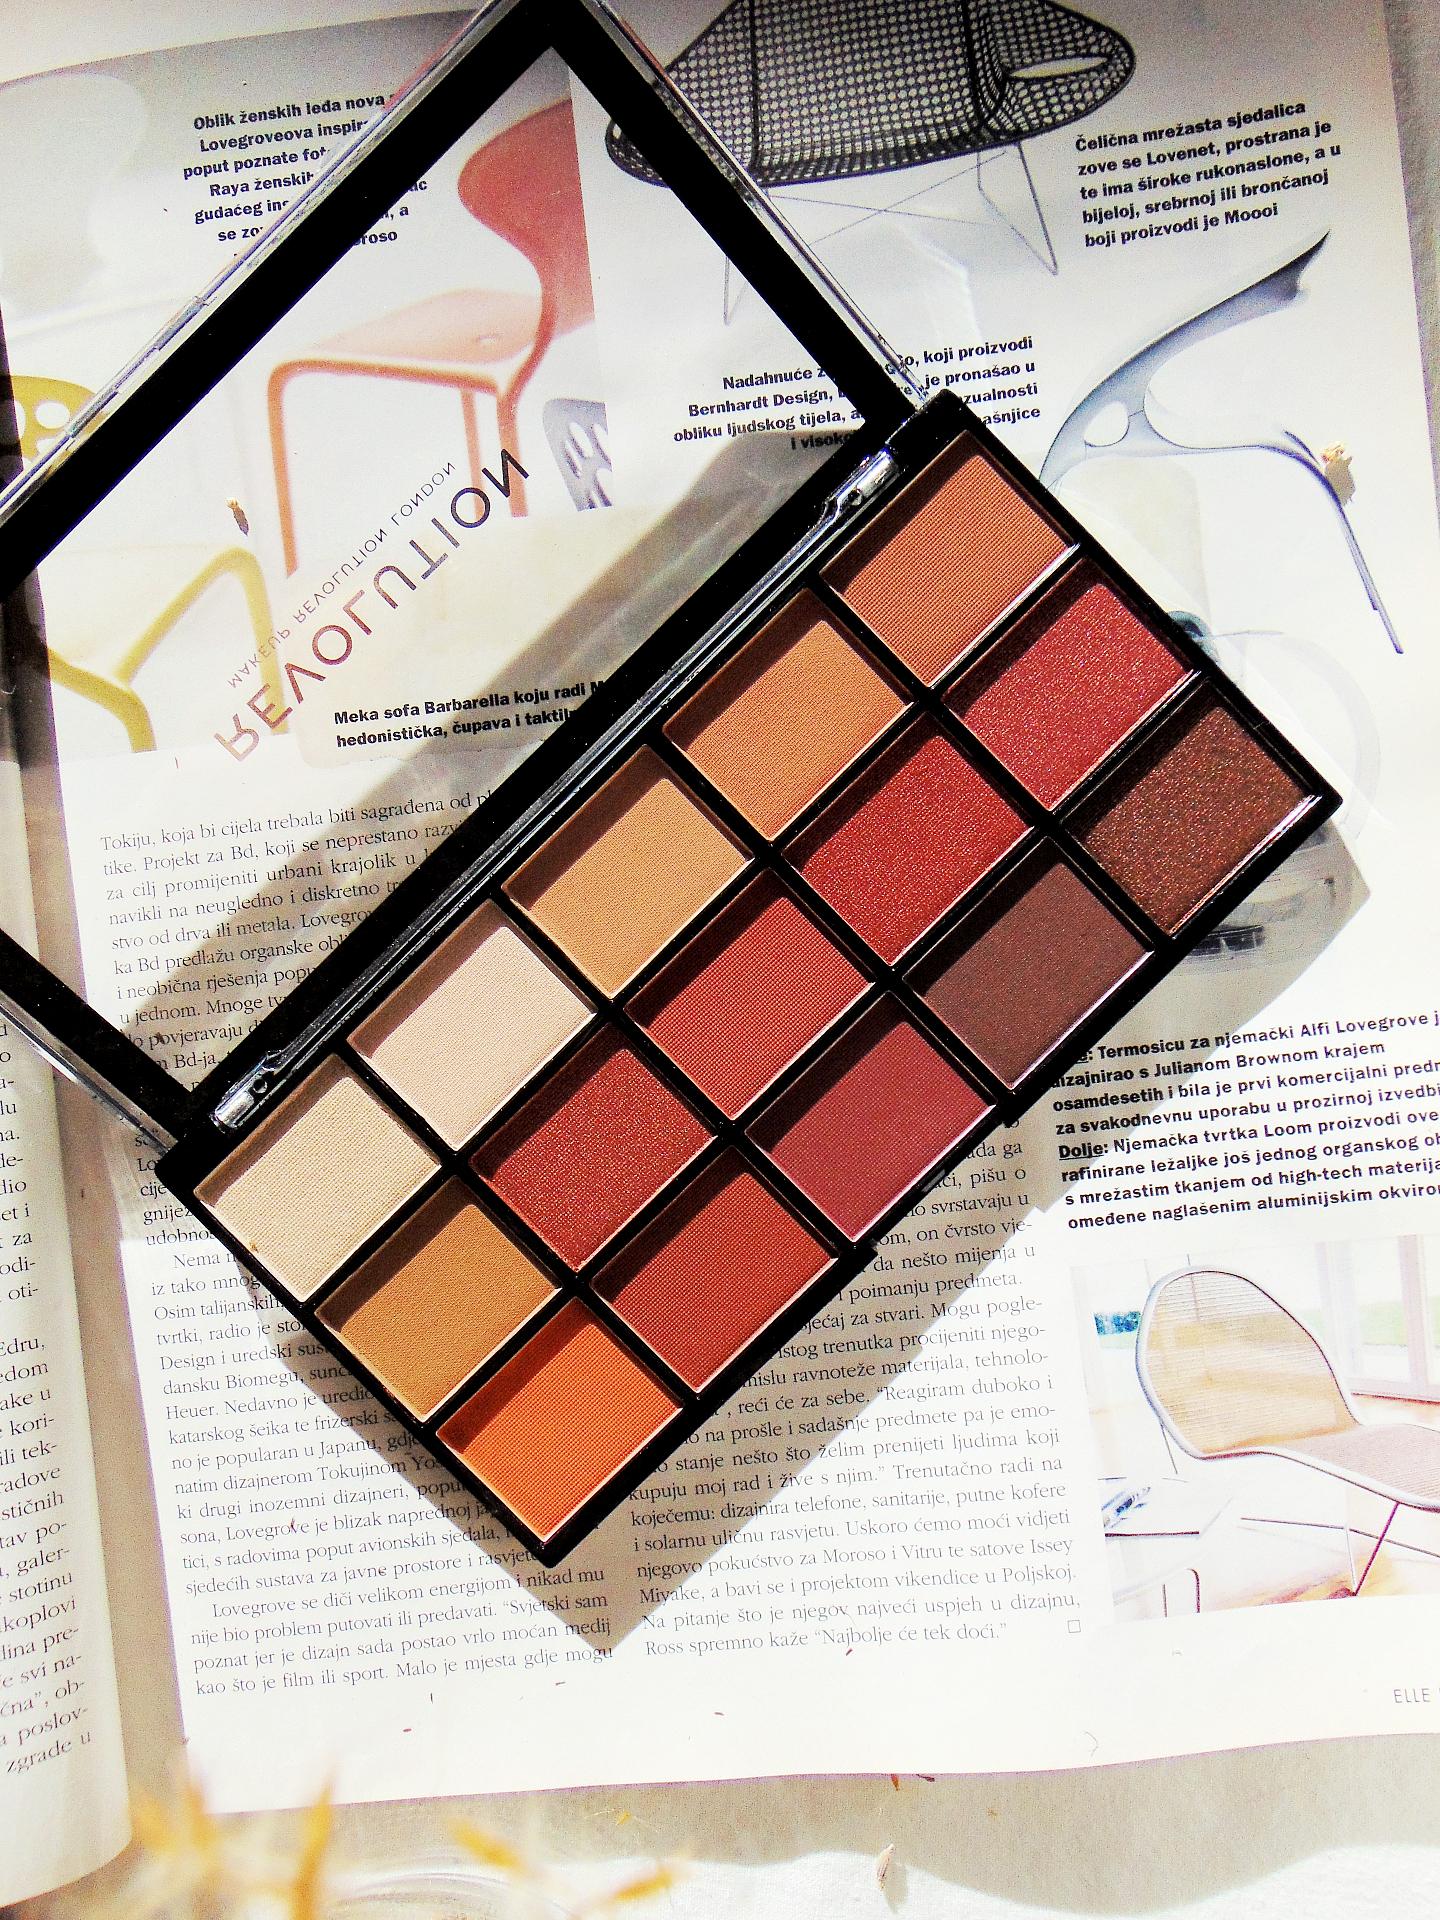 Makeup Revolution London Reloaded Palette Iconic Fever Honest Review